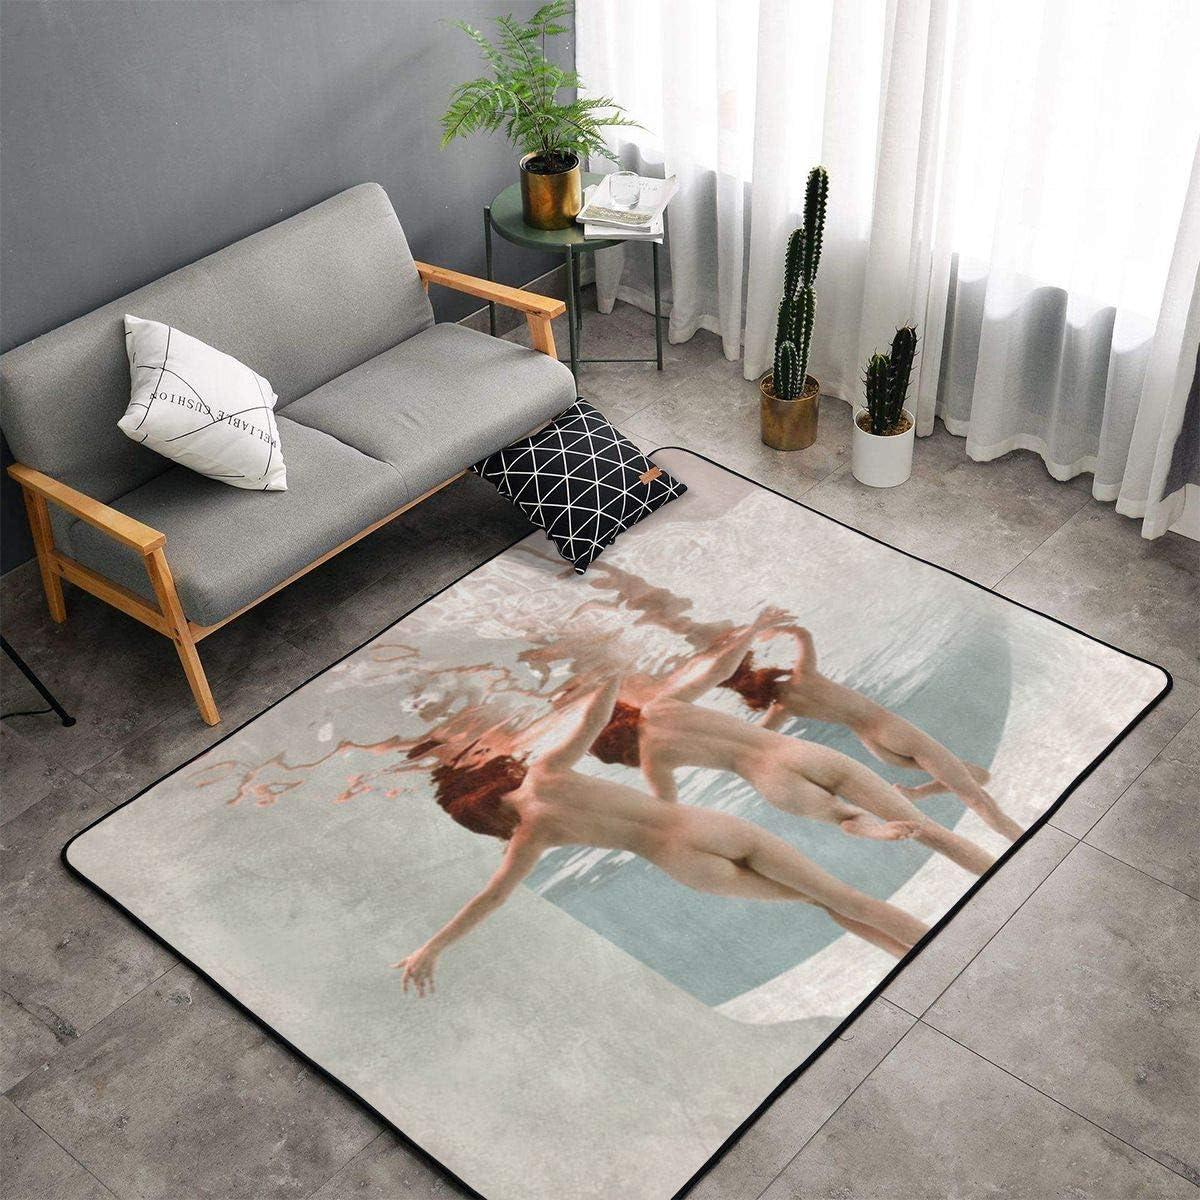 white Butt print area rug white rug with black line art butts bathroom rug butt pattern on throw rug cartoon butts funny bath rug